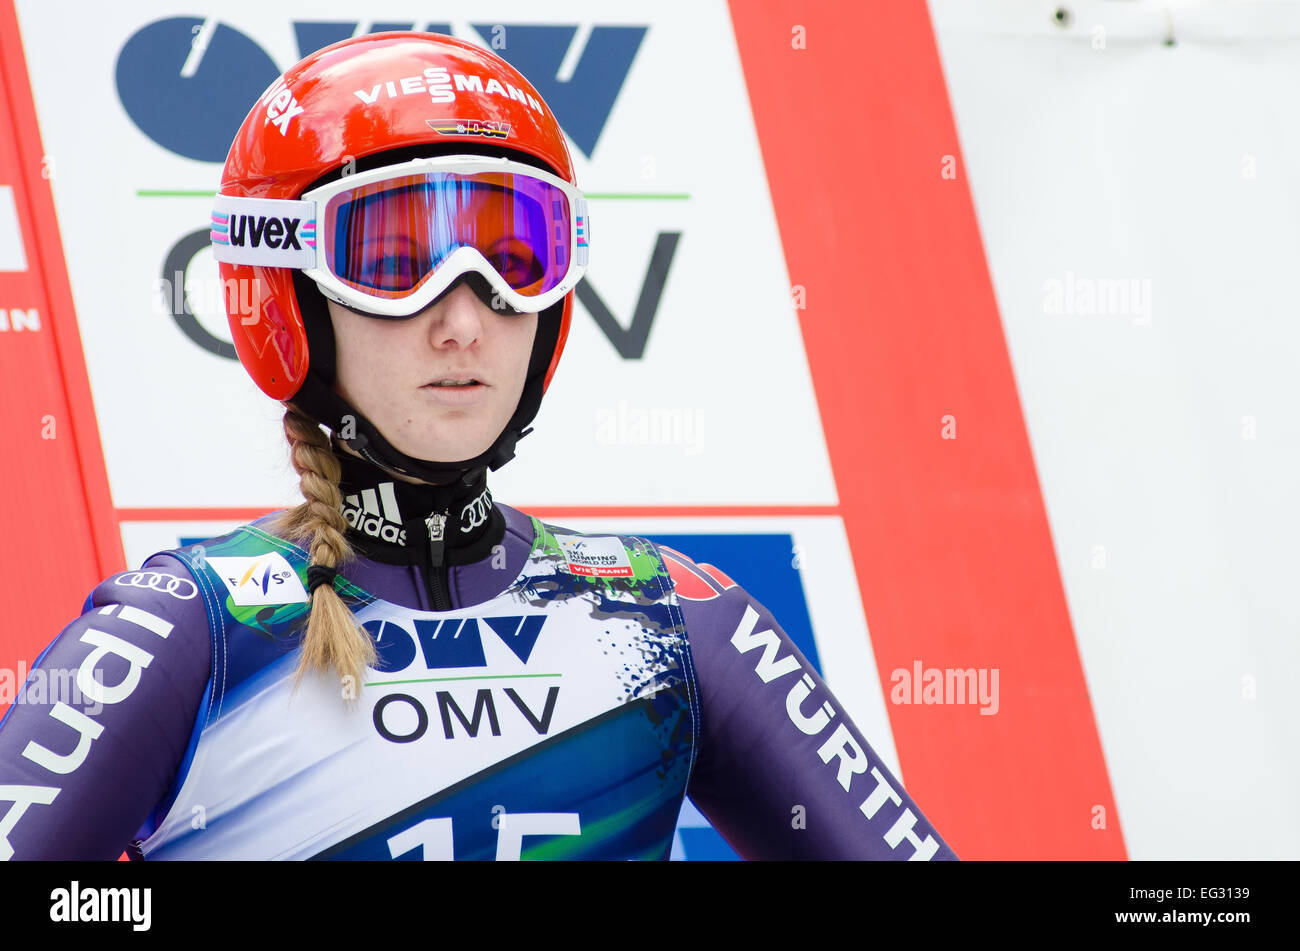 Slovenia. 14th Feb, 2015. Svenja Wuerth (GER) at the Ljubno FIS World Cup Ladies Ski Jumping. Credit:  Rok Rakun/Pacific - Stock Image